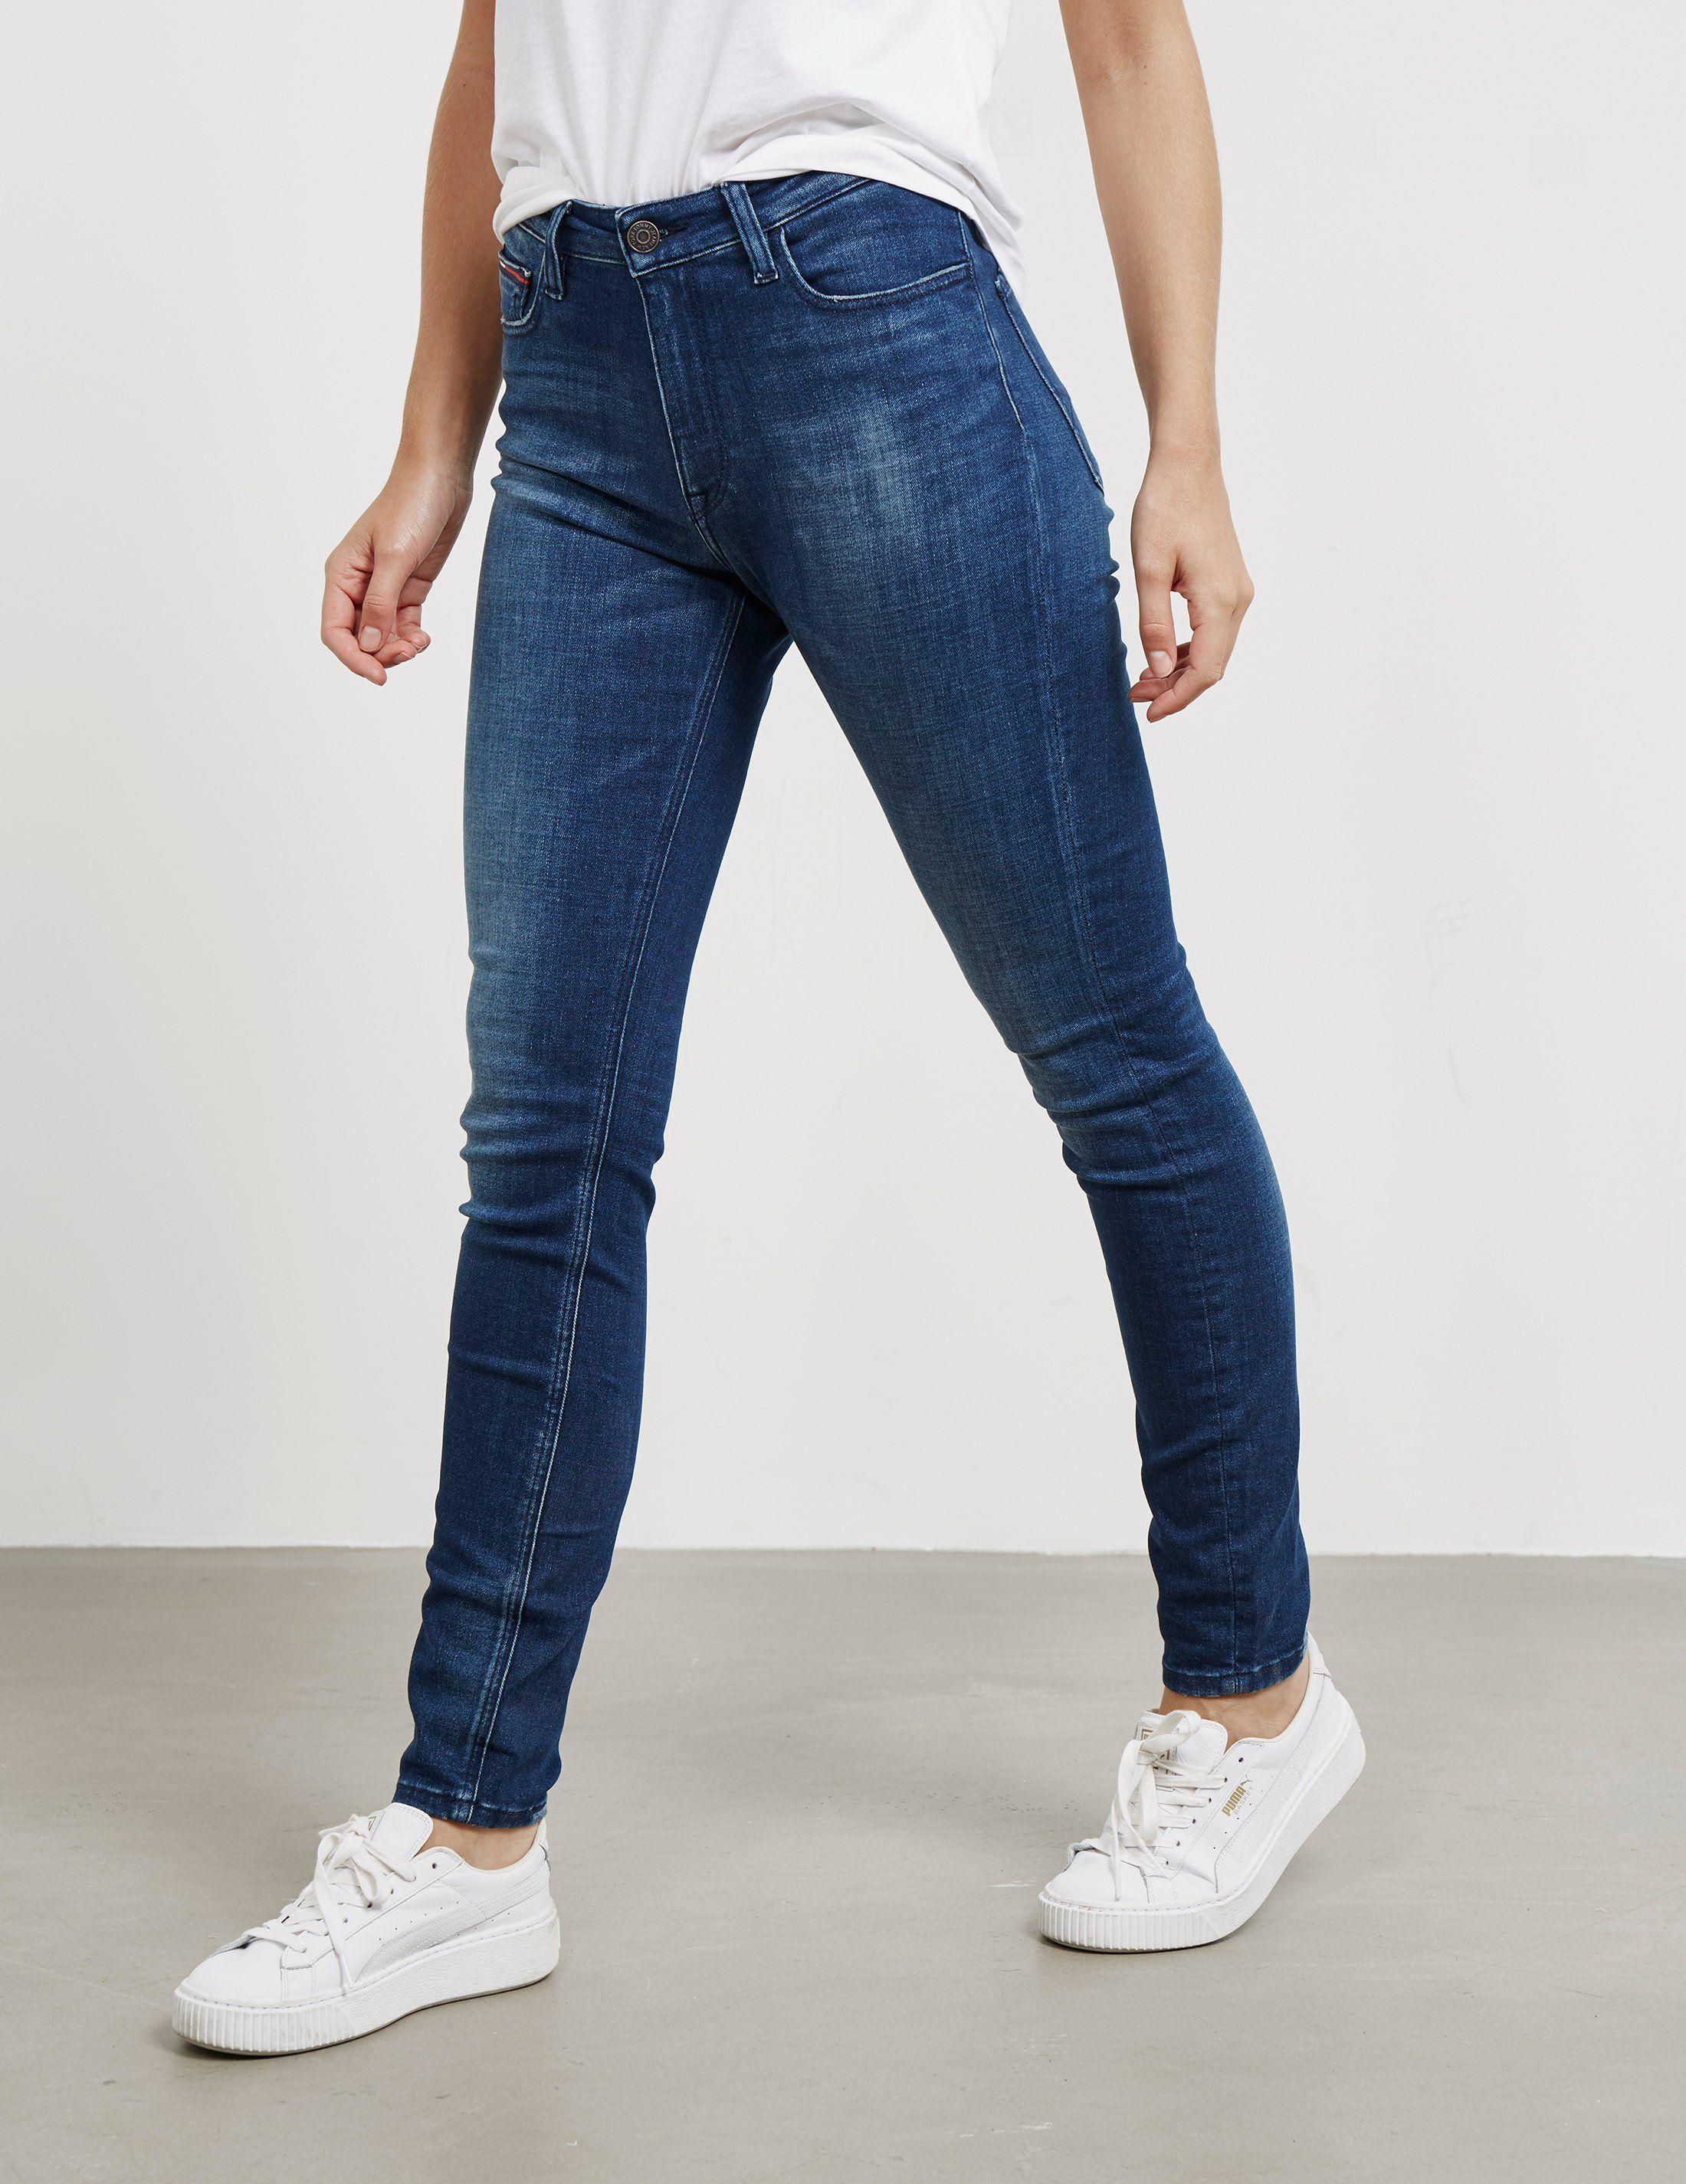 Tommy Jeans Santana High Rise Skinny Jeans